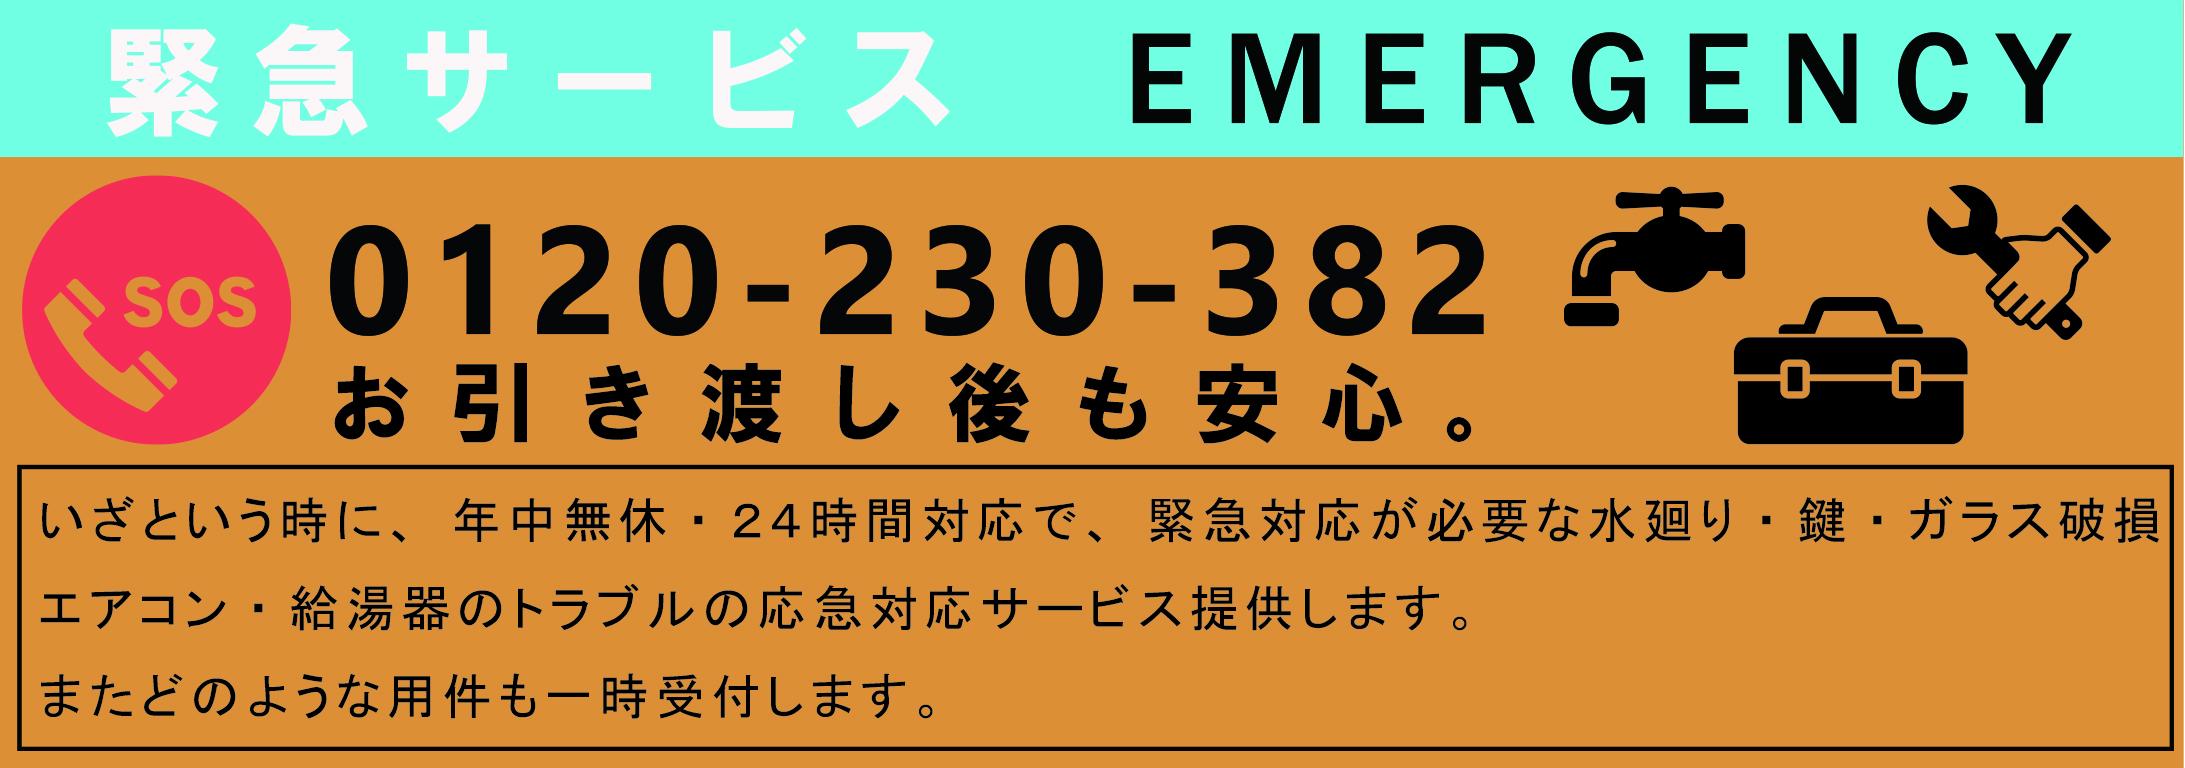 0120-230-382